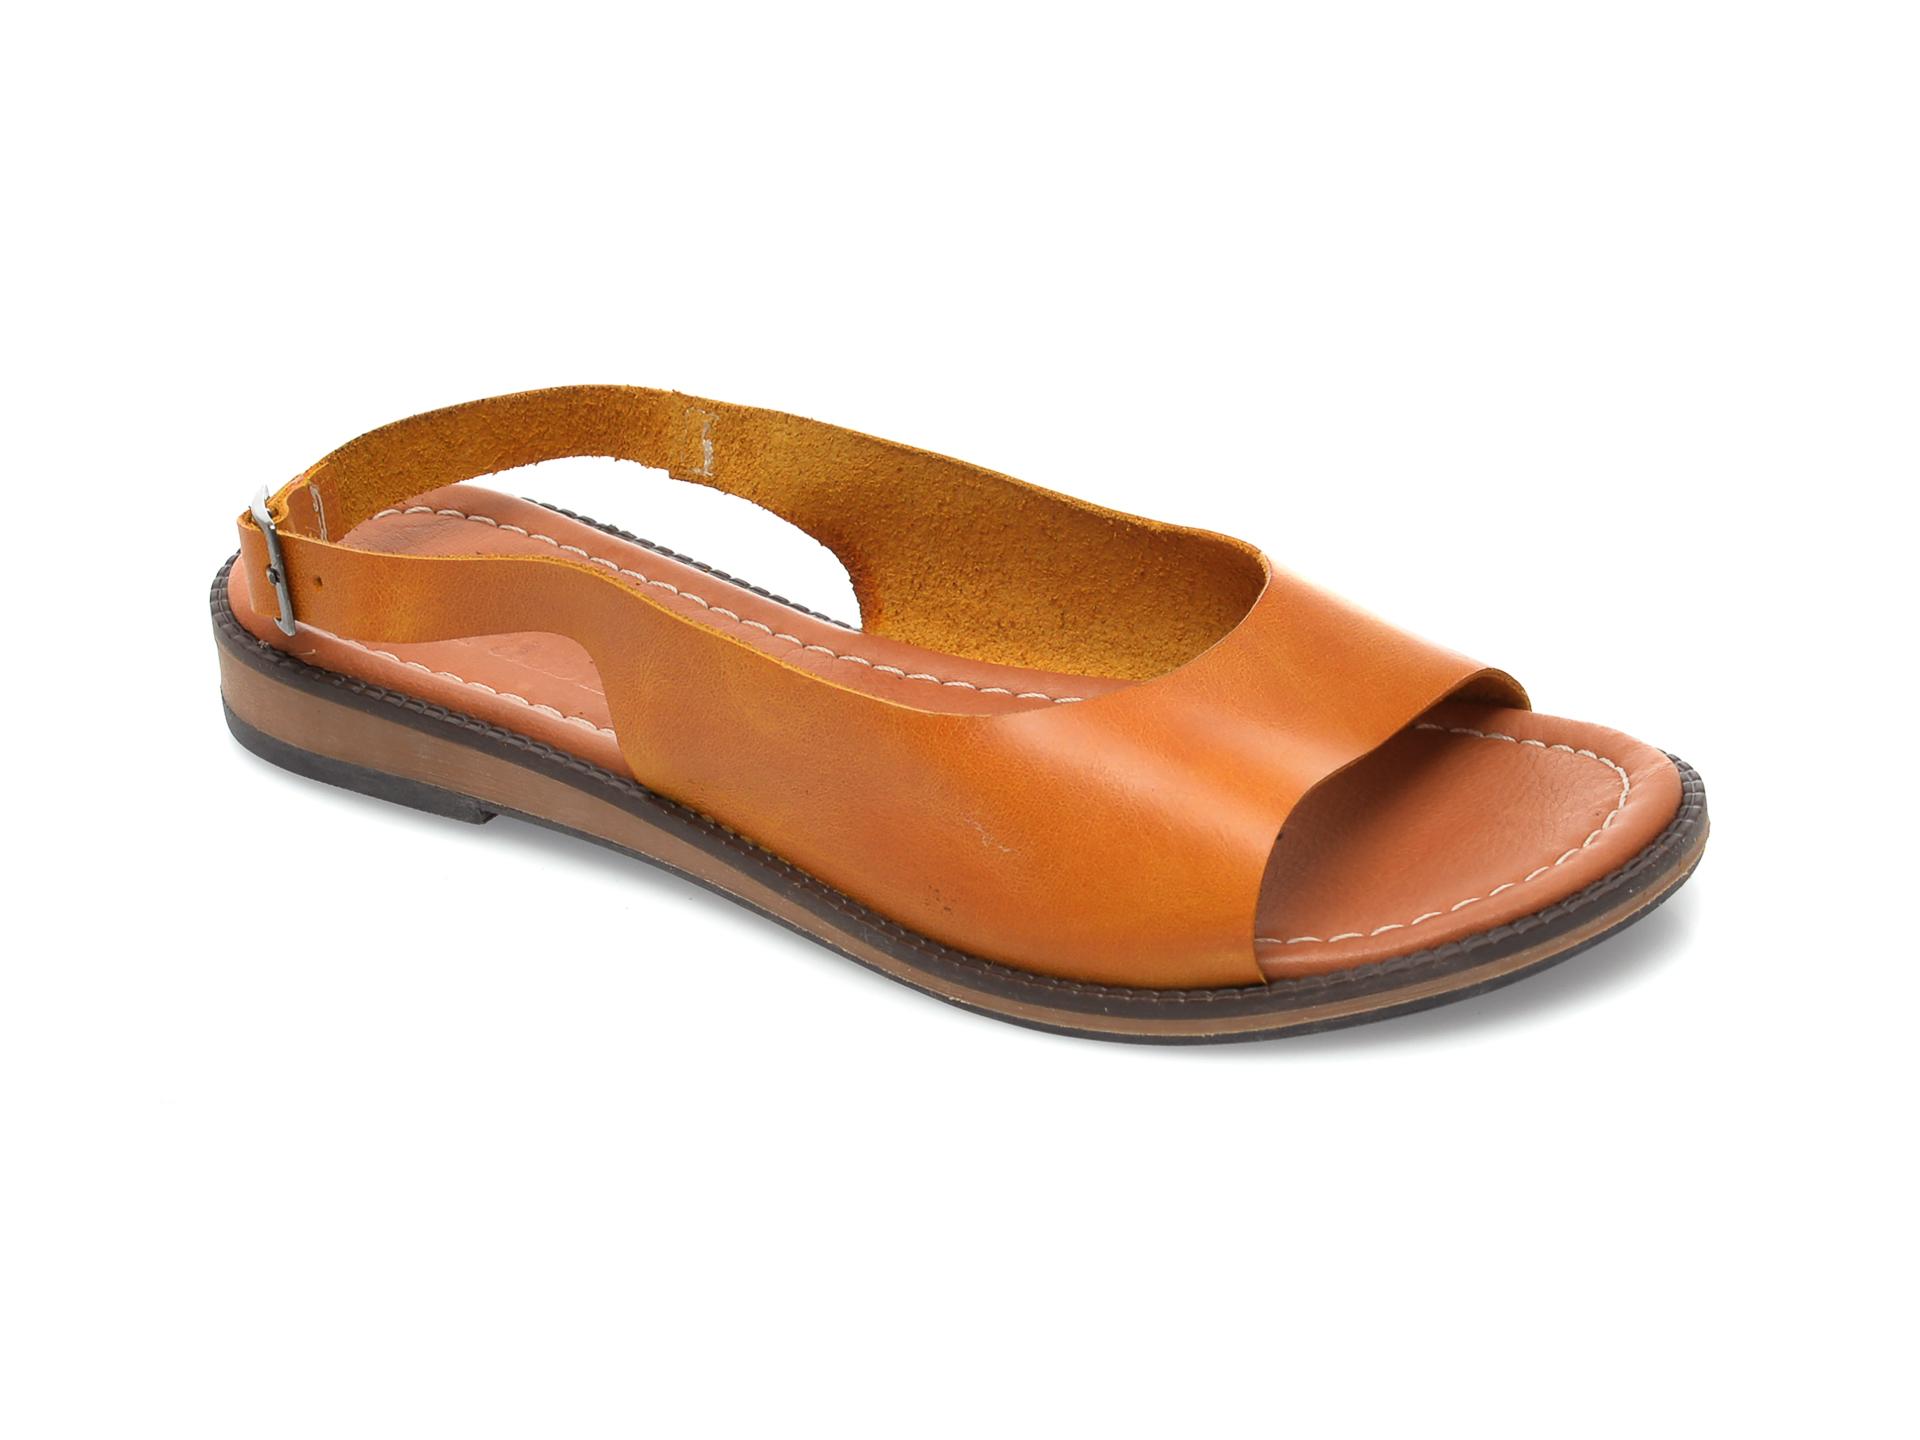 Sandale FLAVIA PASSINI galbene, 103, din piele naturala New